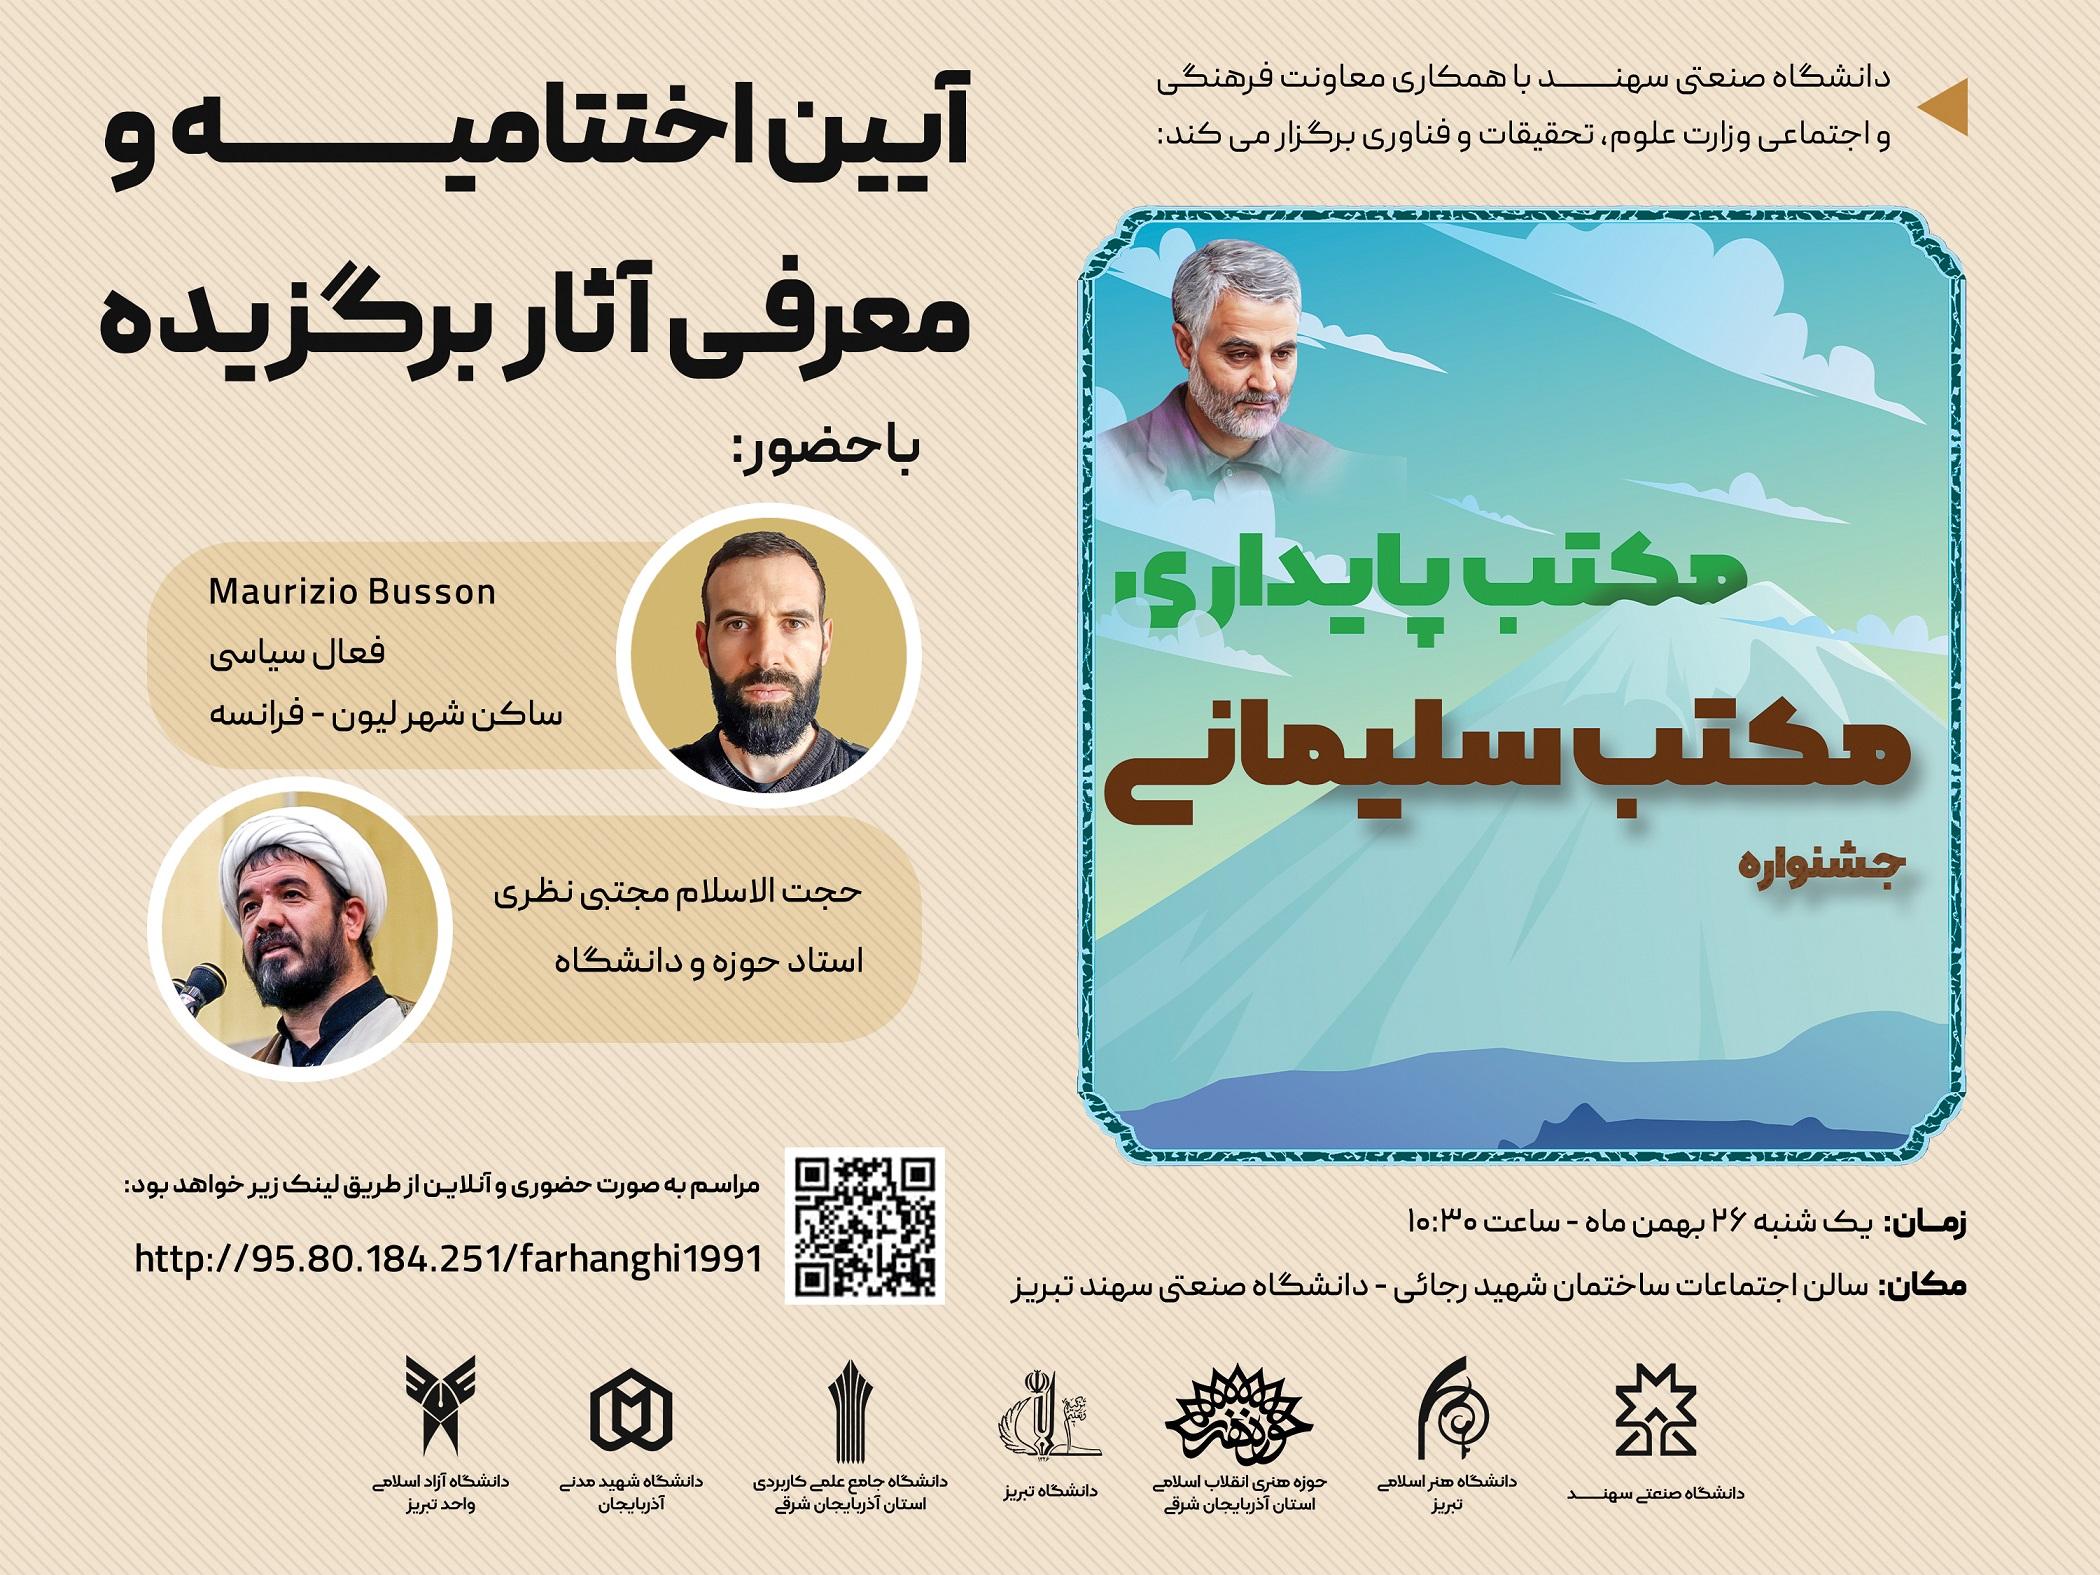 جشنواره مکتب سلیمانی ؛ مکتب پایداری